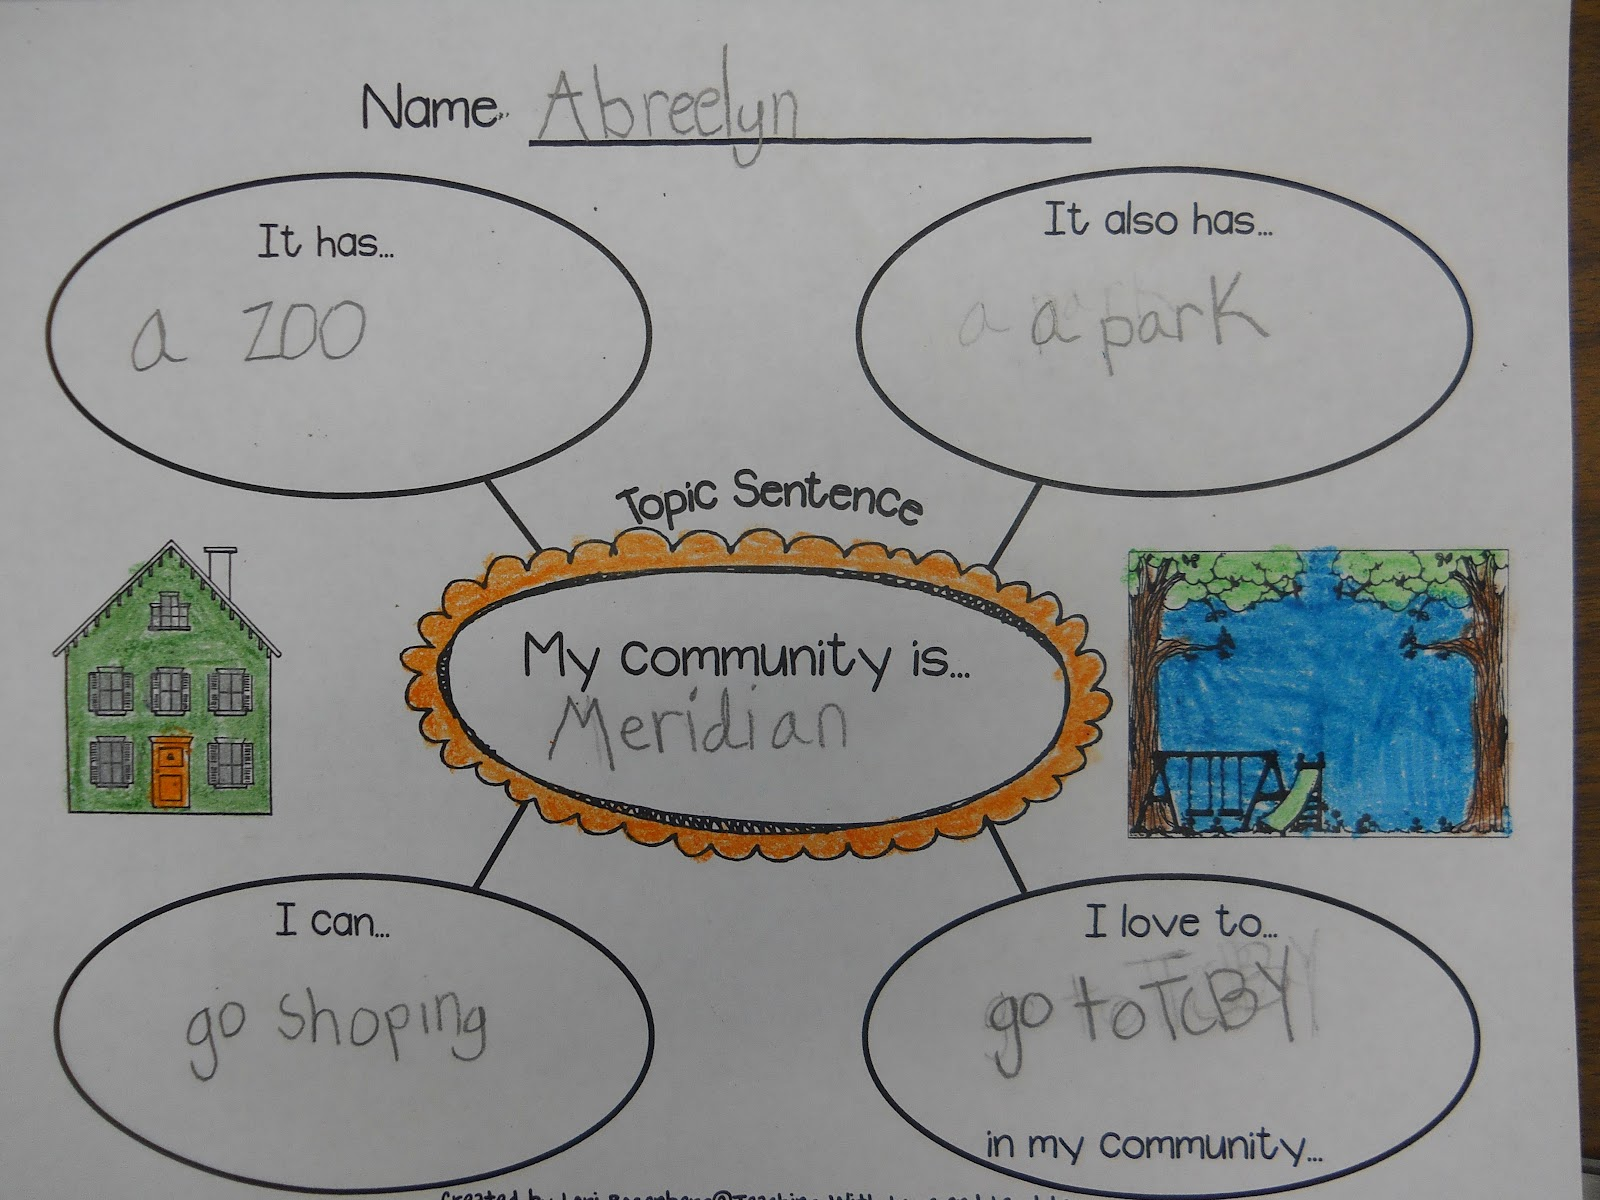 My community essay